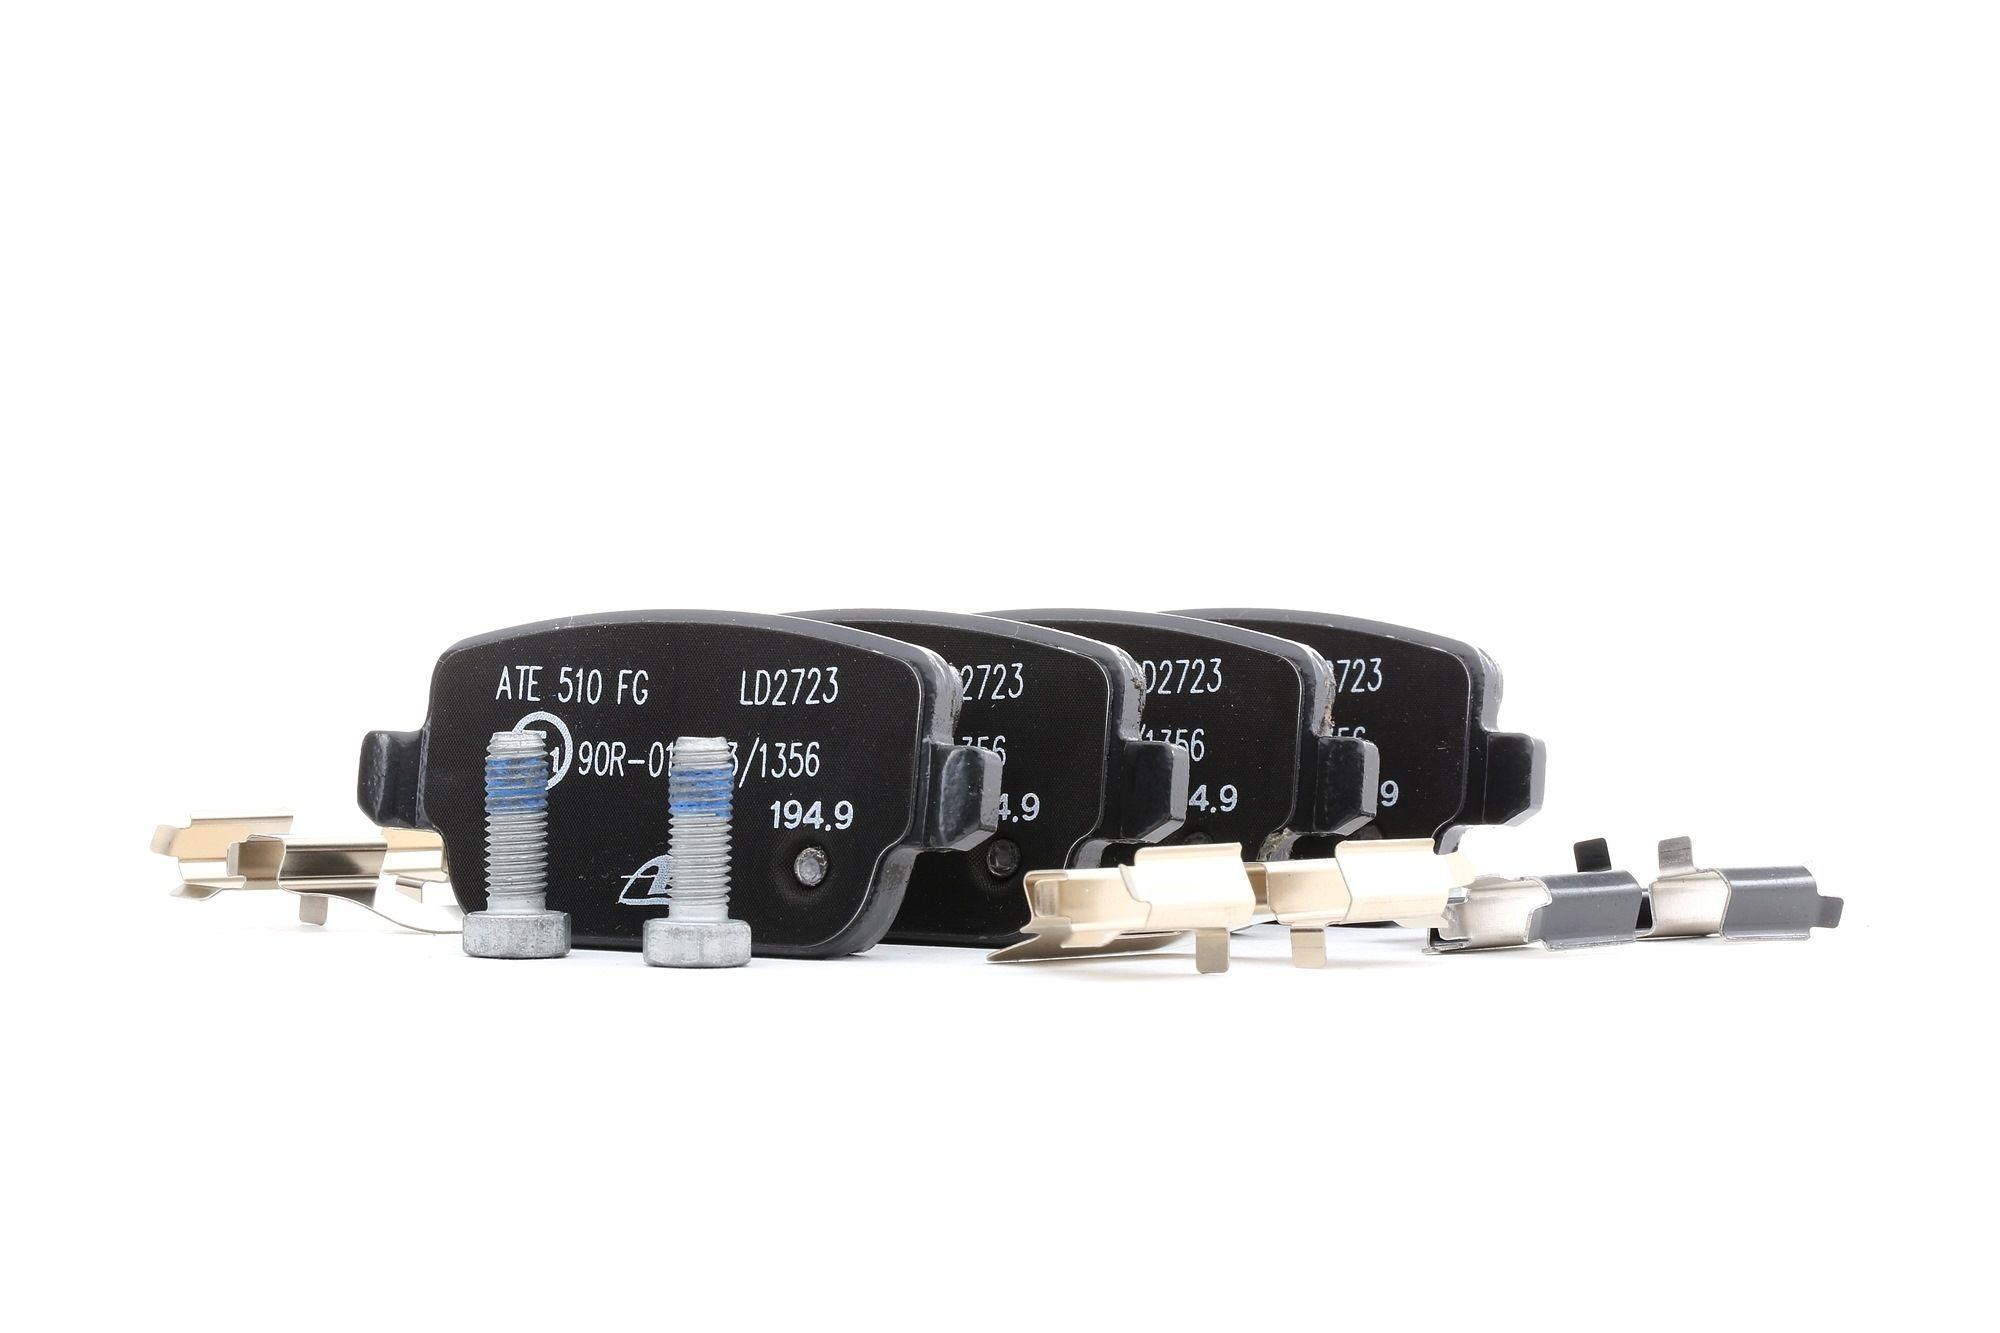 FORD KUGA 2020 Bremsbelagsatz - Original ATE 13.0470-2723.2 Höhe: 43,2mm, Breite: 95,1mm, Dicke/Stärke: 16,1mm